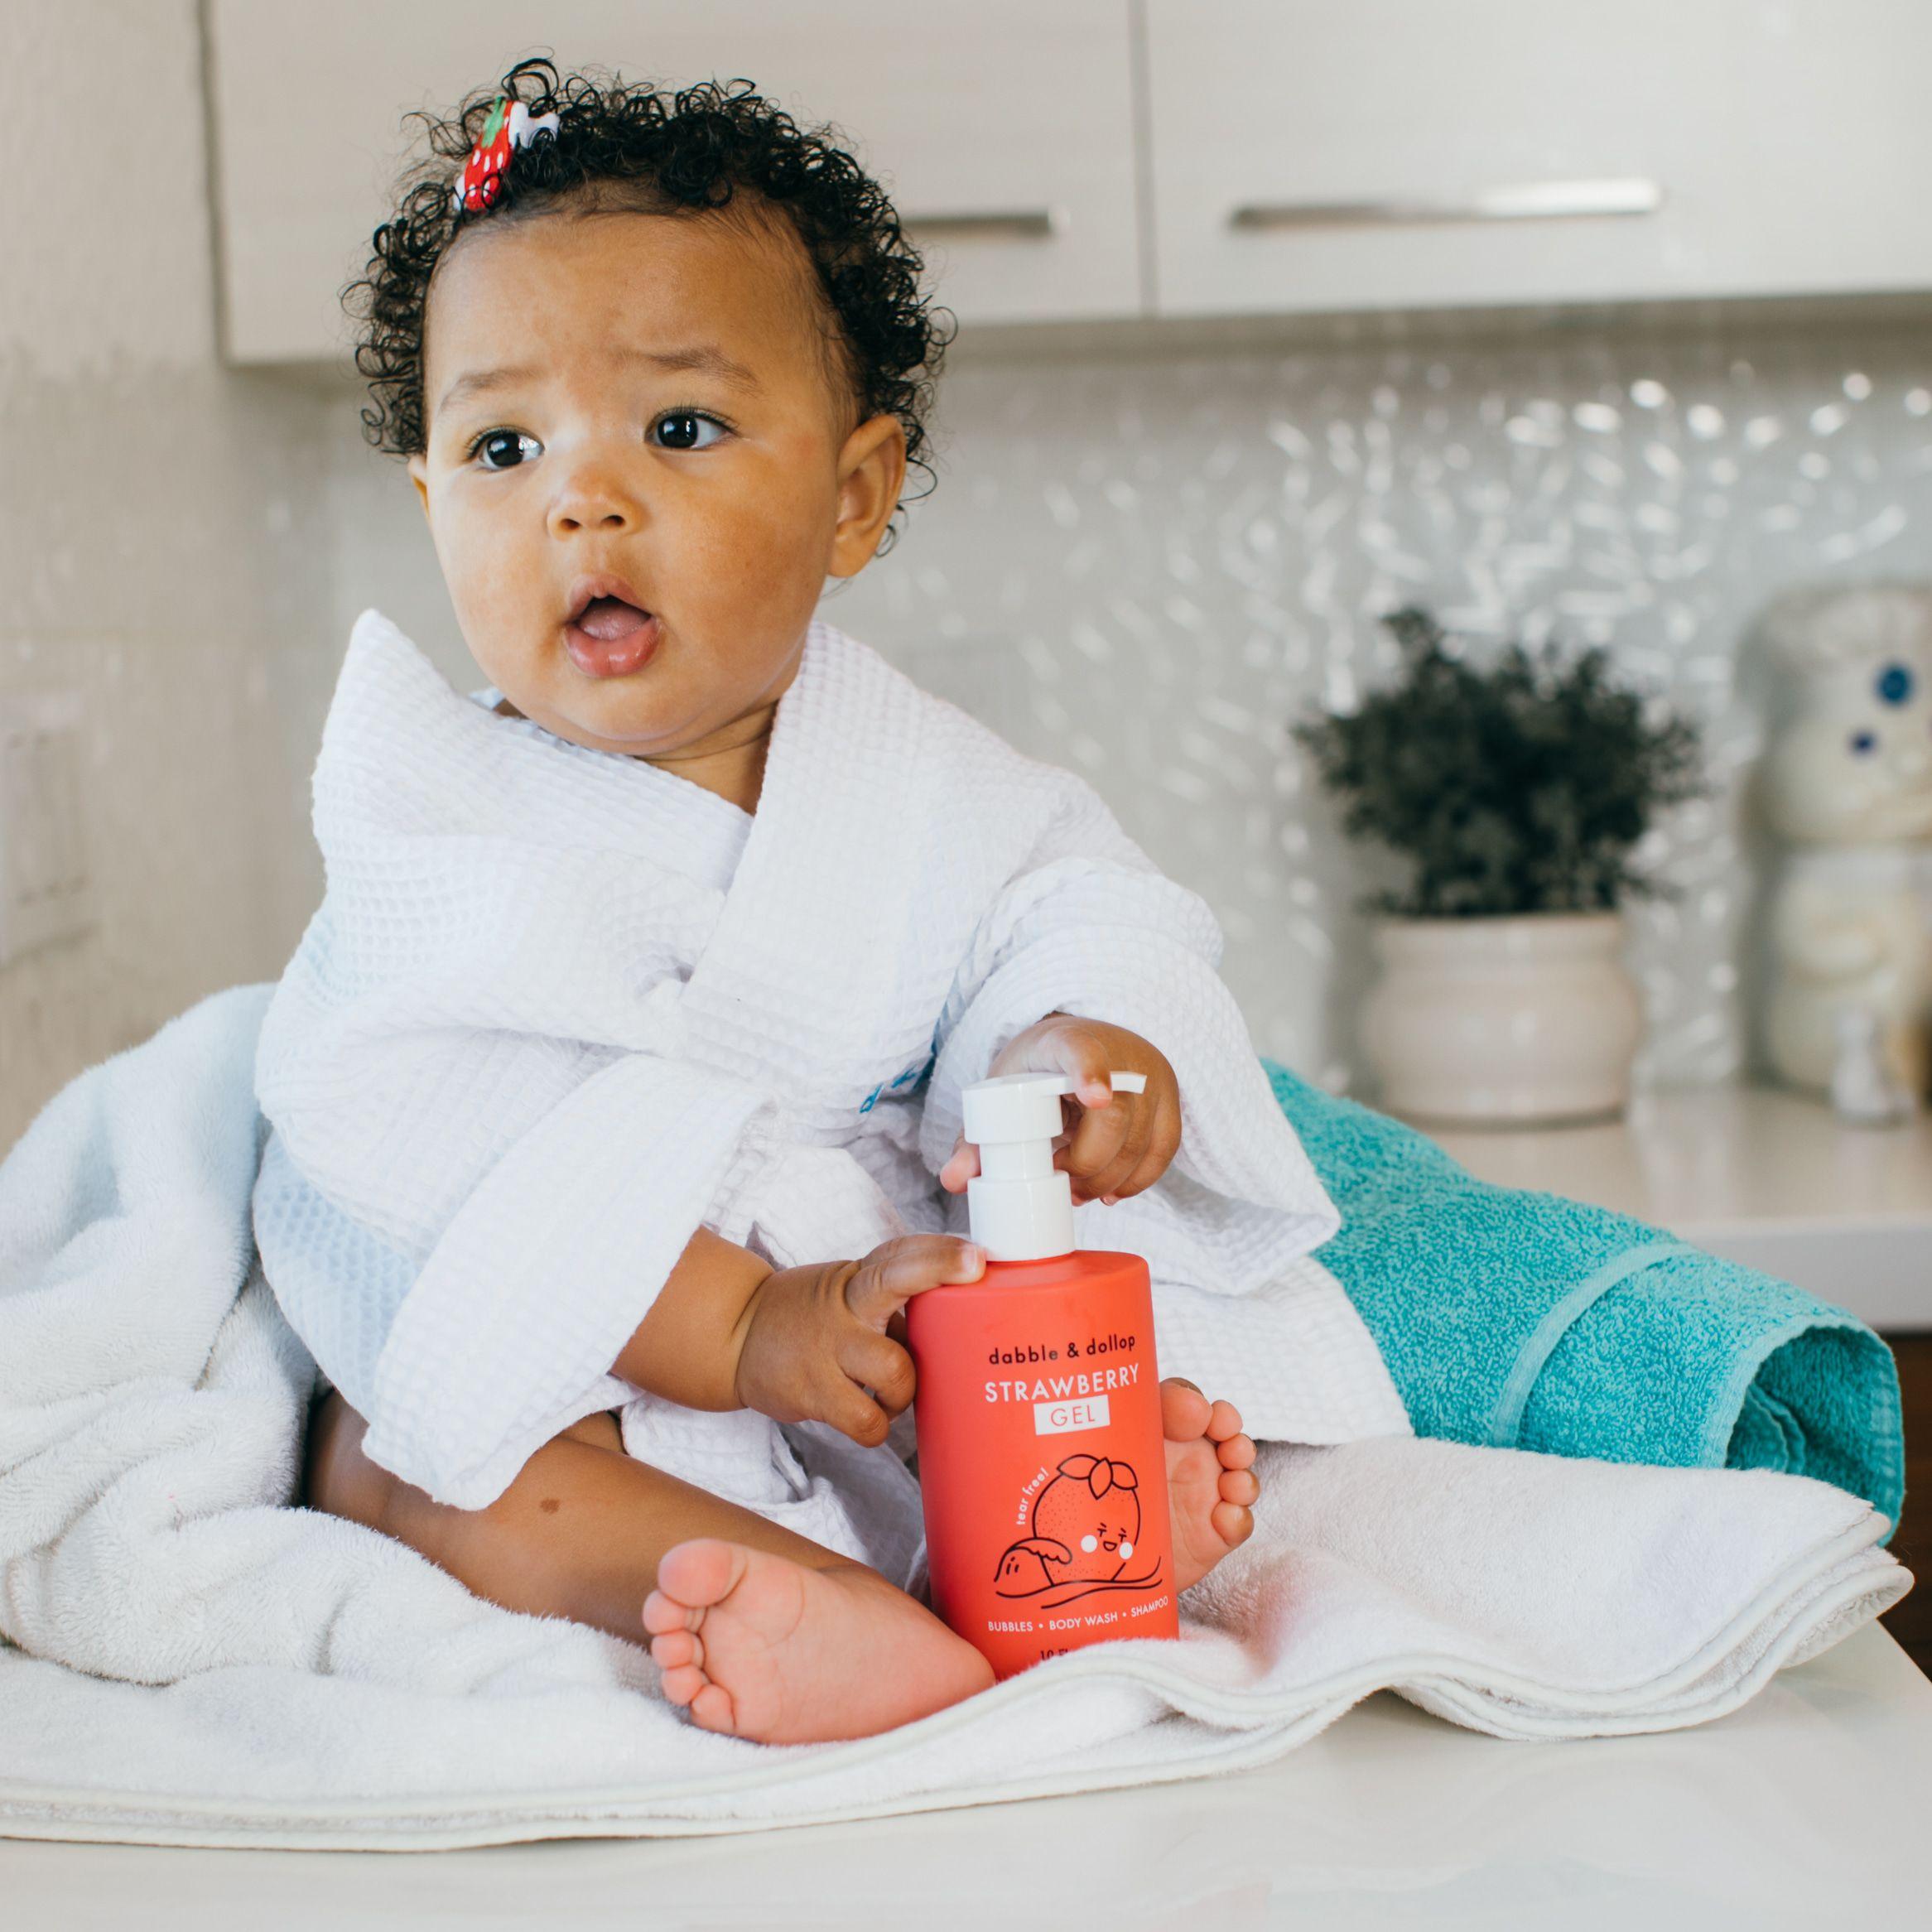 Toddler in white robe holding bottle of strawberry shampoo